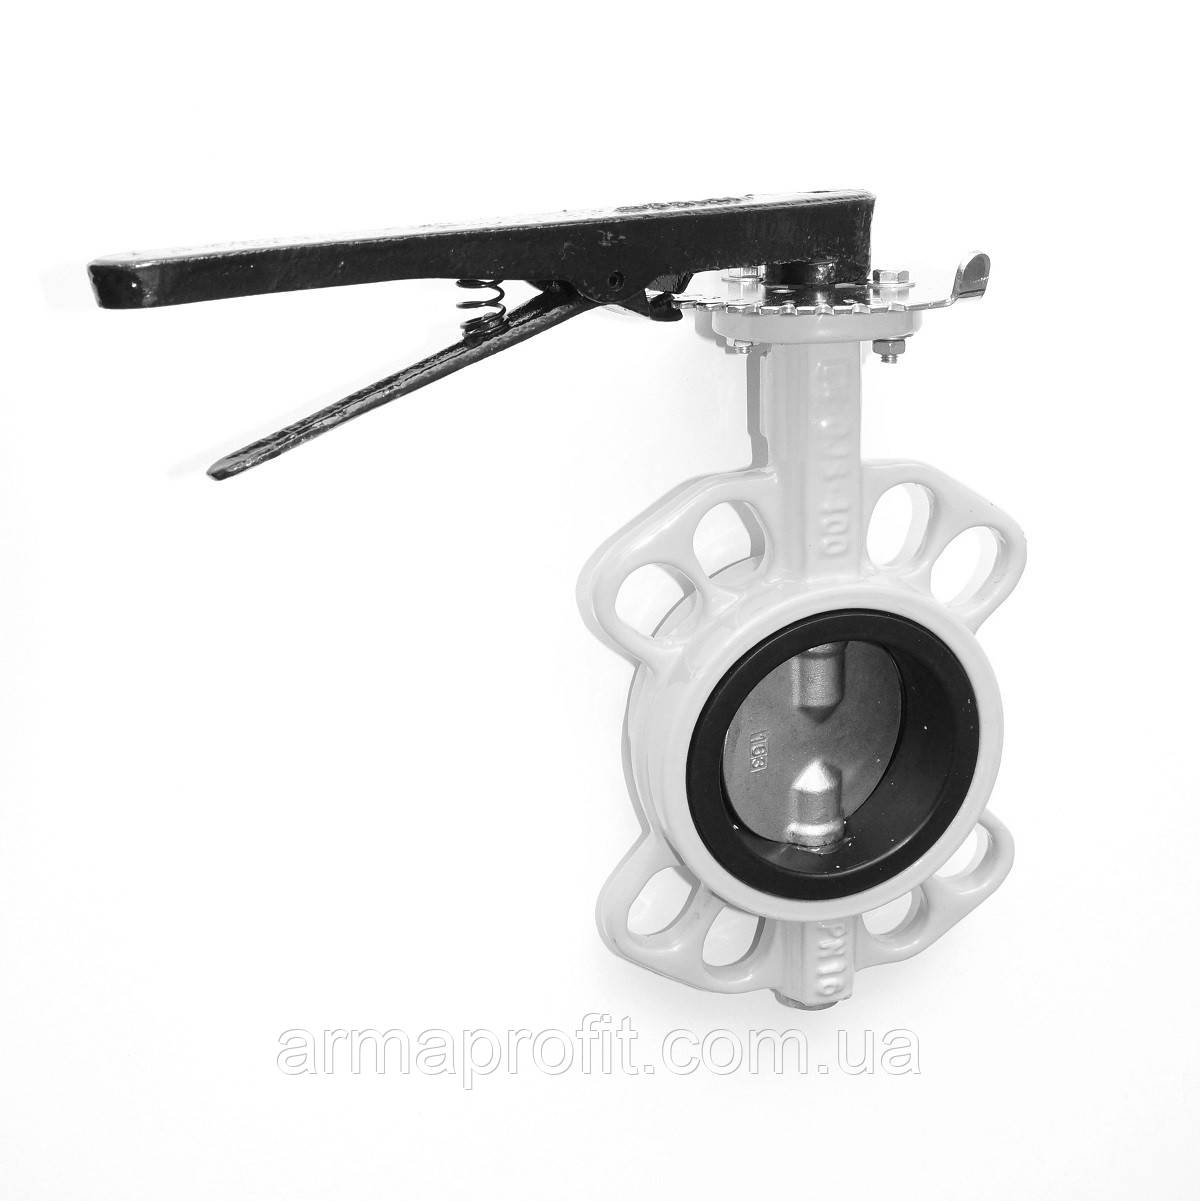 Задвижка поворотная Баттерфляй для газа RBV-16-40(G) Ду50 Ру16 (P204)